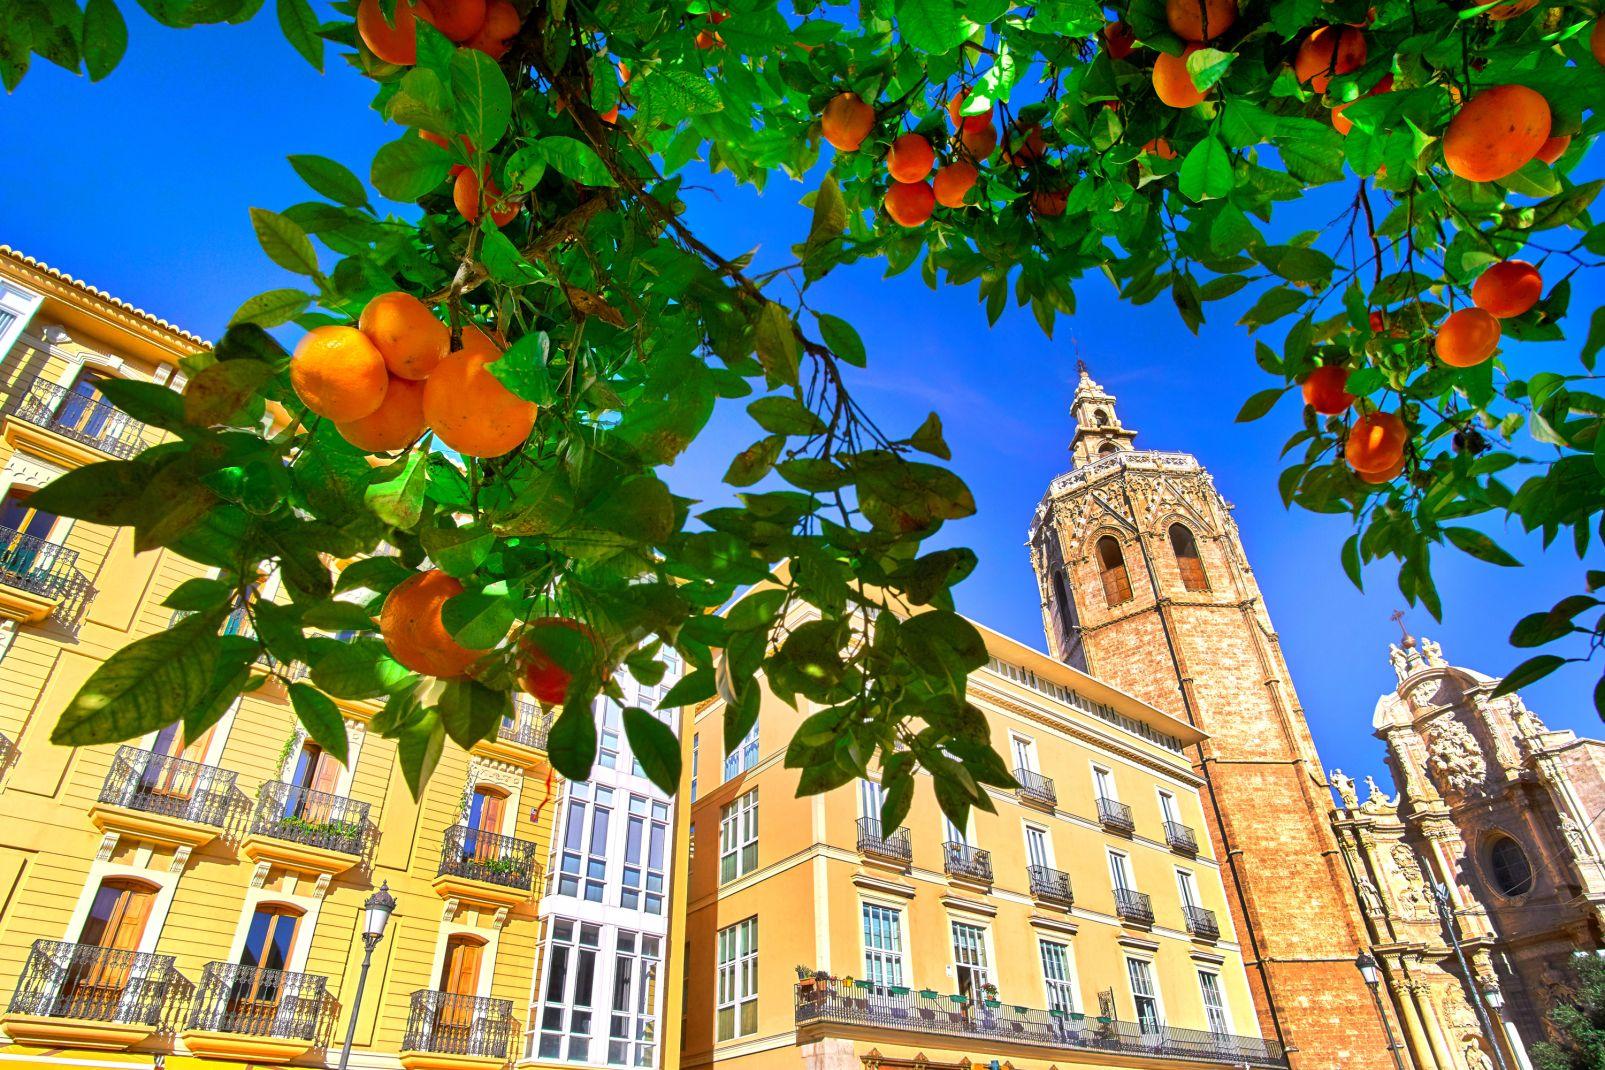 Europe; Espagne; Communauté de Valence; Valence;